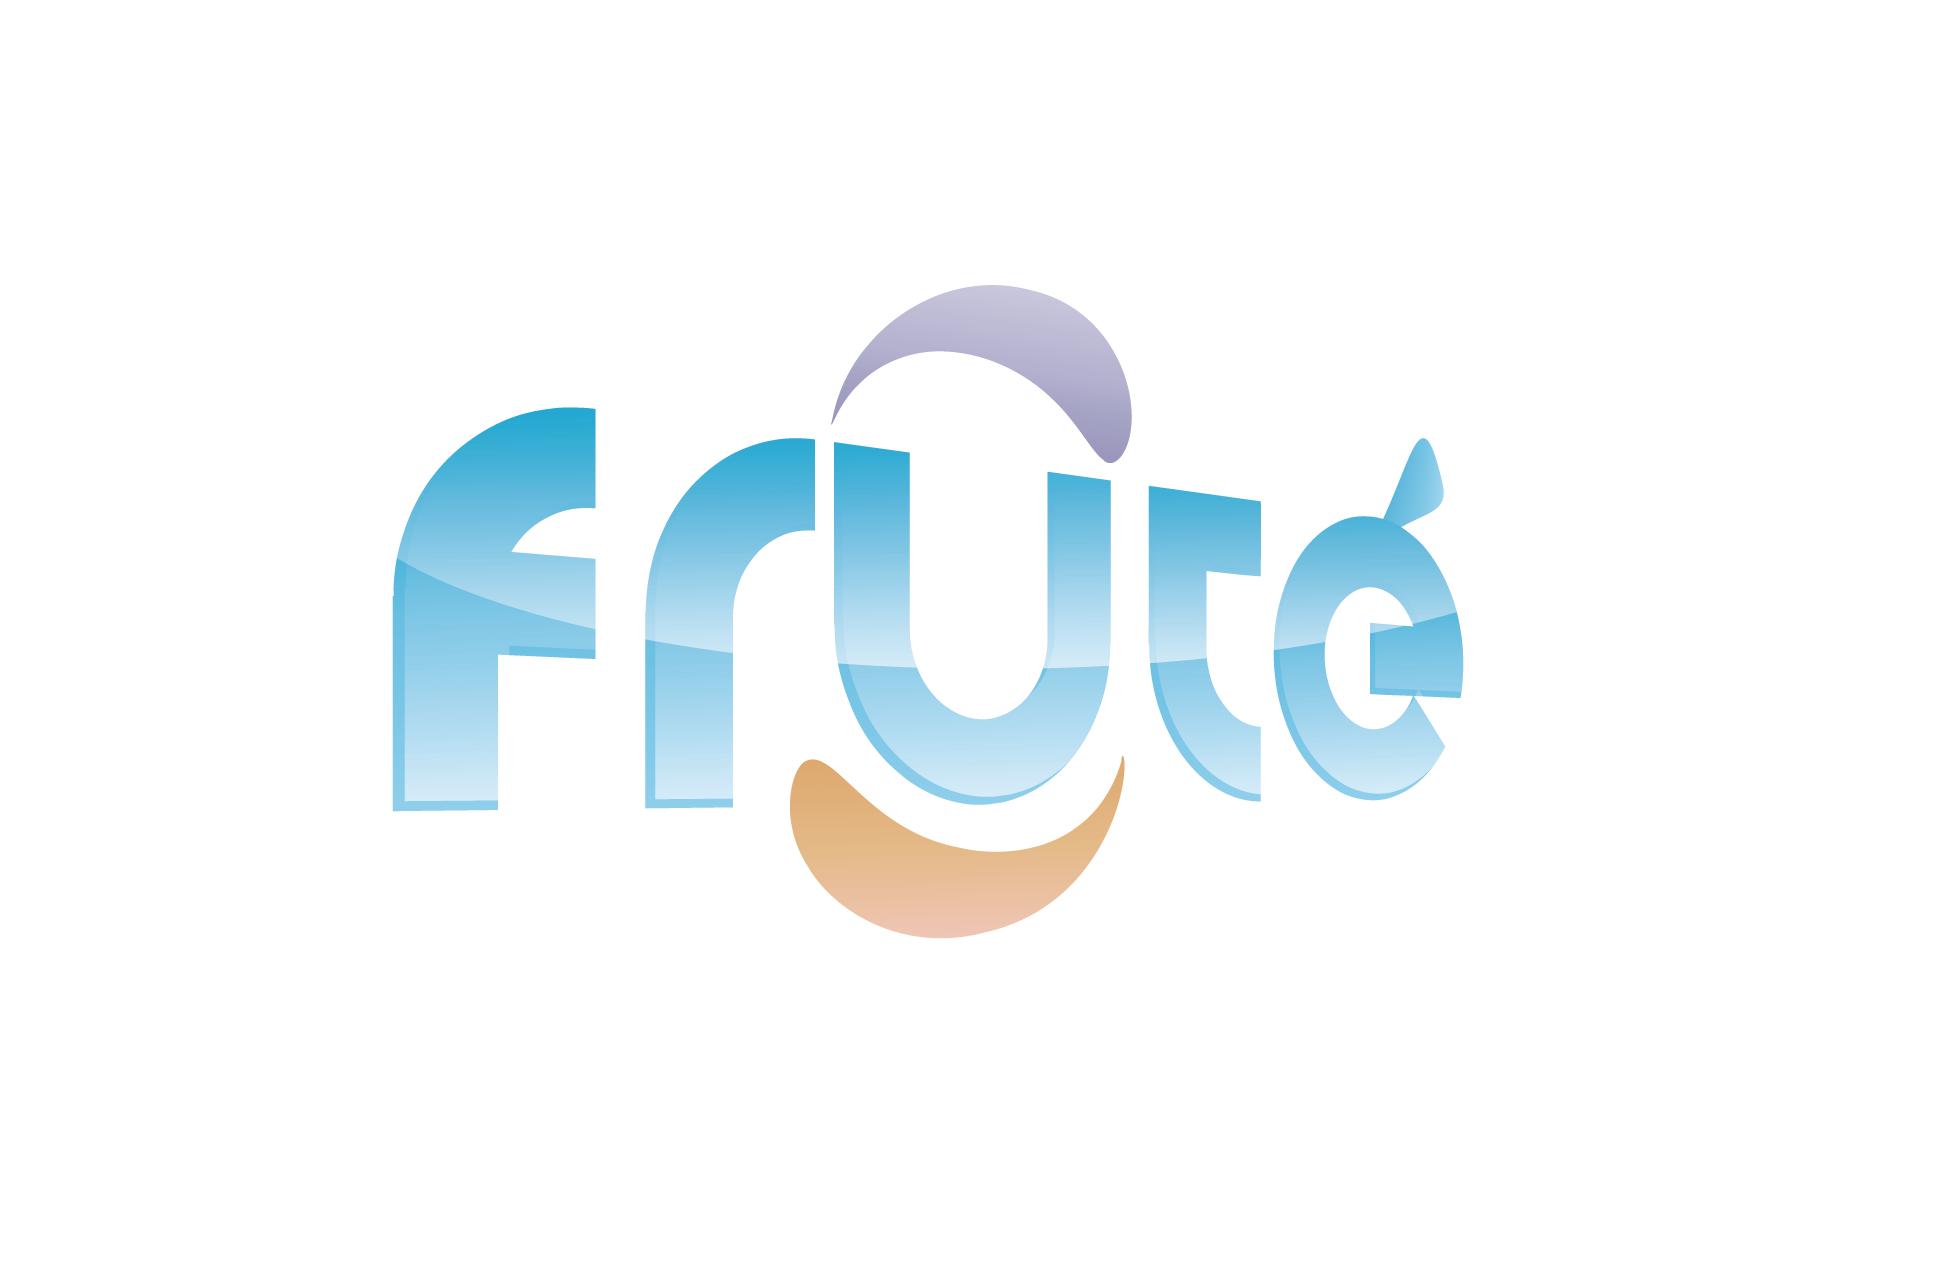 Logo Design by Tim Holley - Entry No. 93 in the Logo Design Contest Imaginative Logo Design for Fruté.